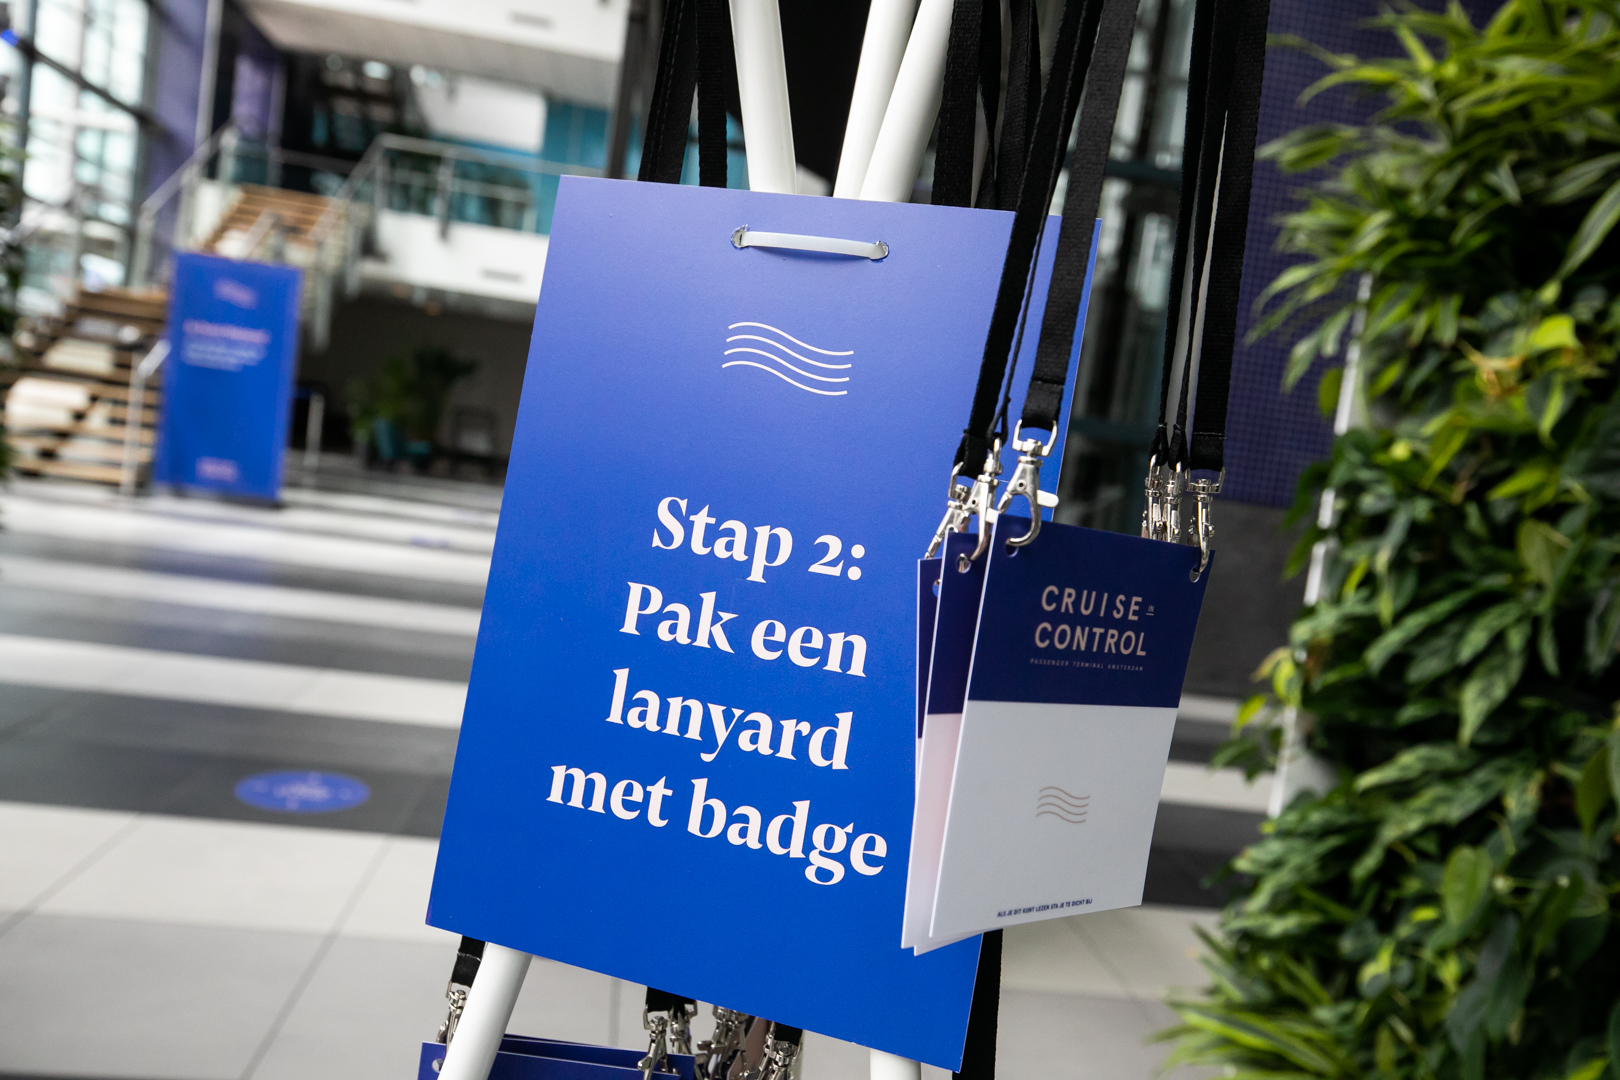 Check-in: lanyard